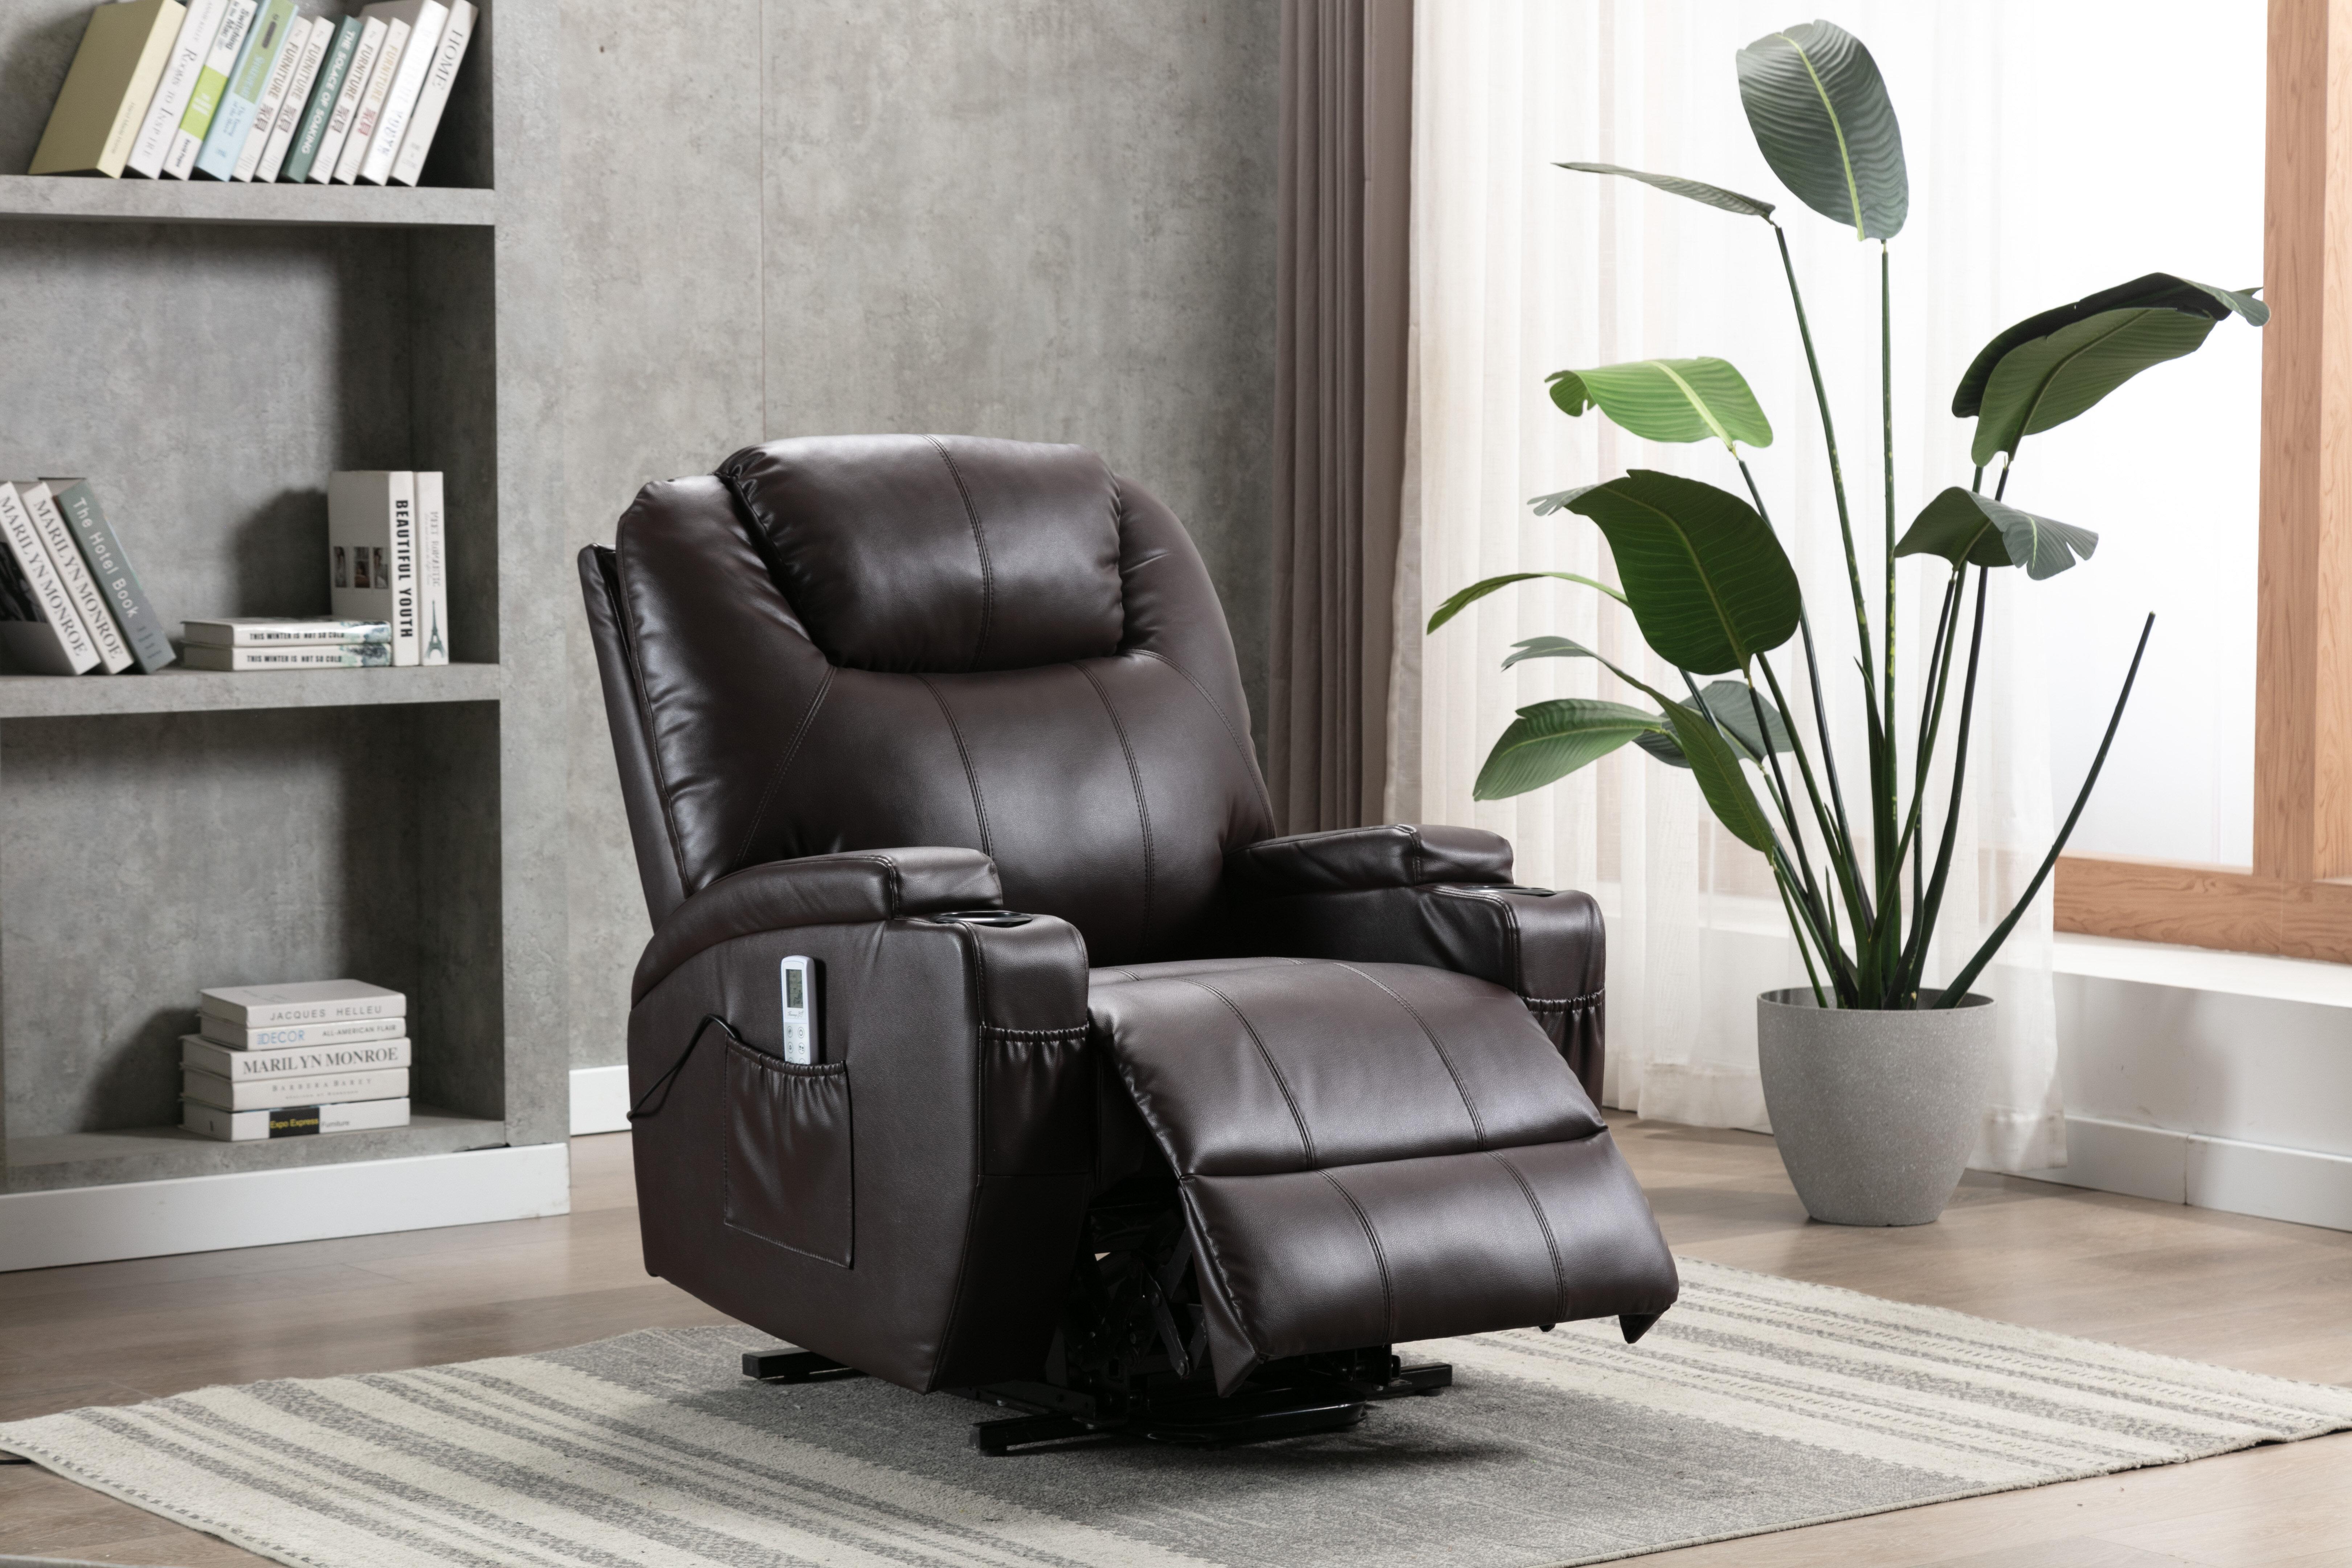 Ebern Designs Annarae Faux Leather Power Lift Assist Recliner With Massage Reviews Wayfair